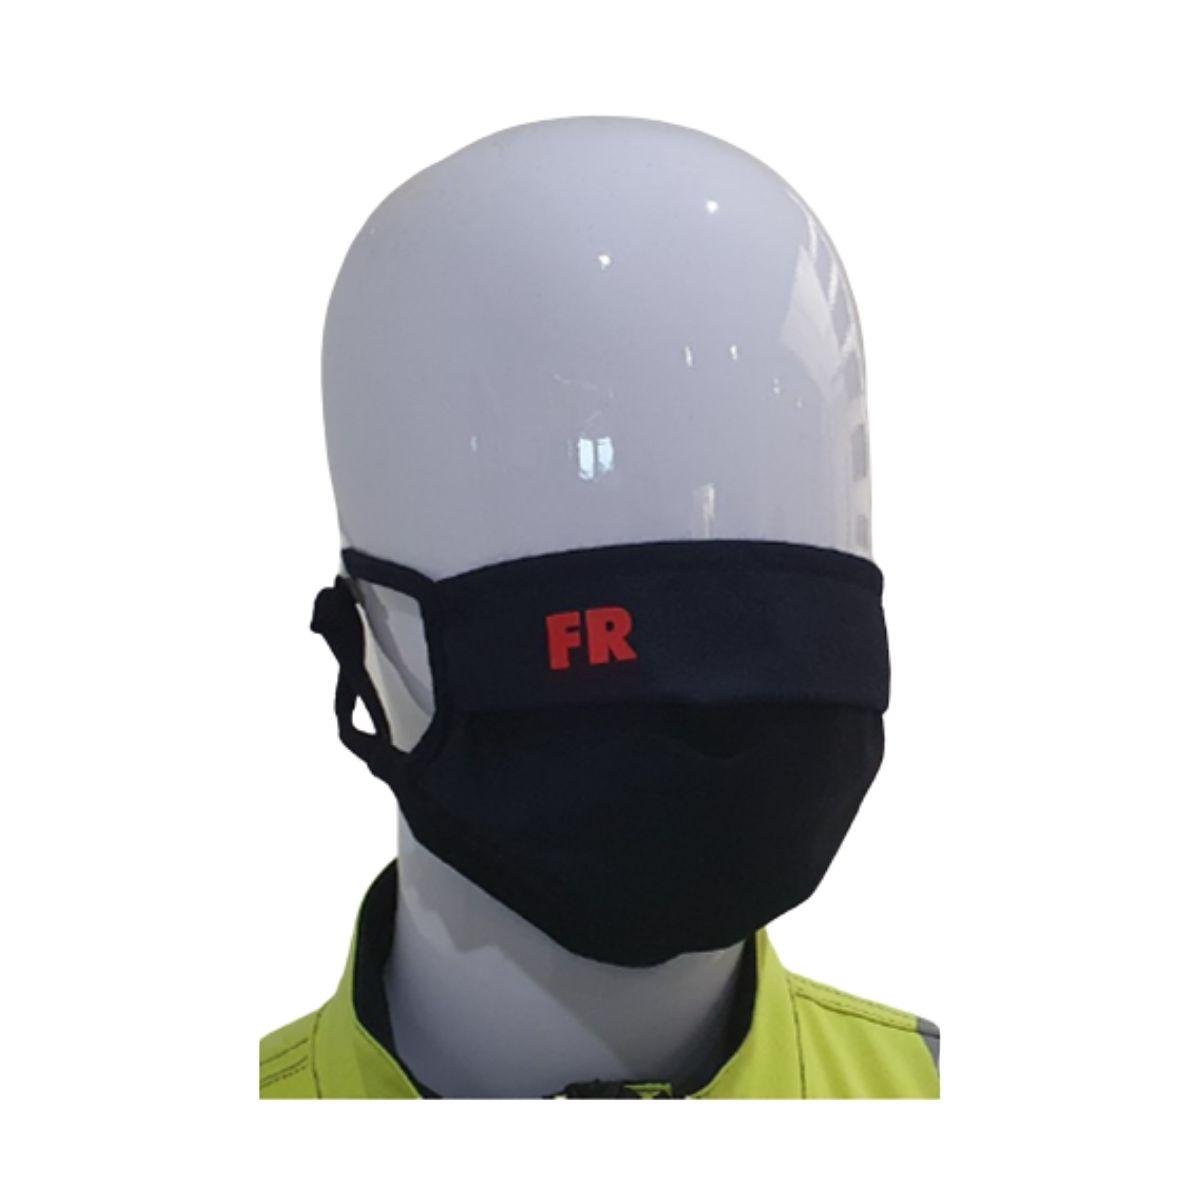 FR0055 Antiviral, Flame Retardant Washable Face Mask - Front